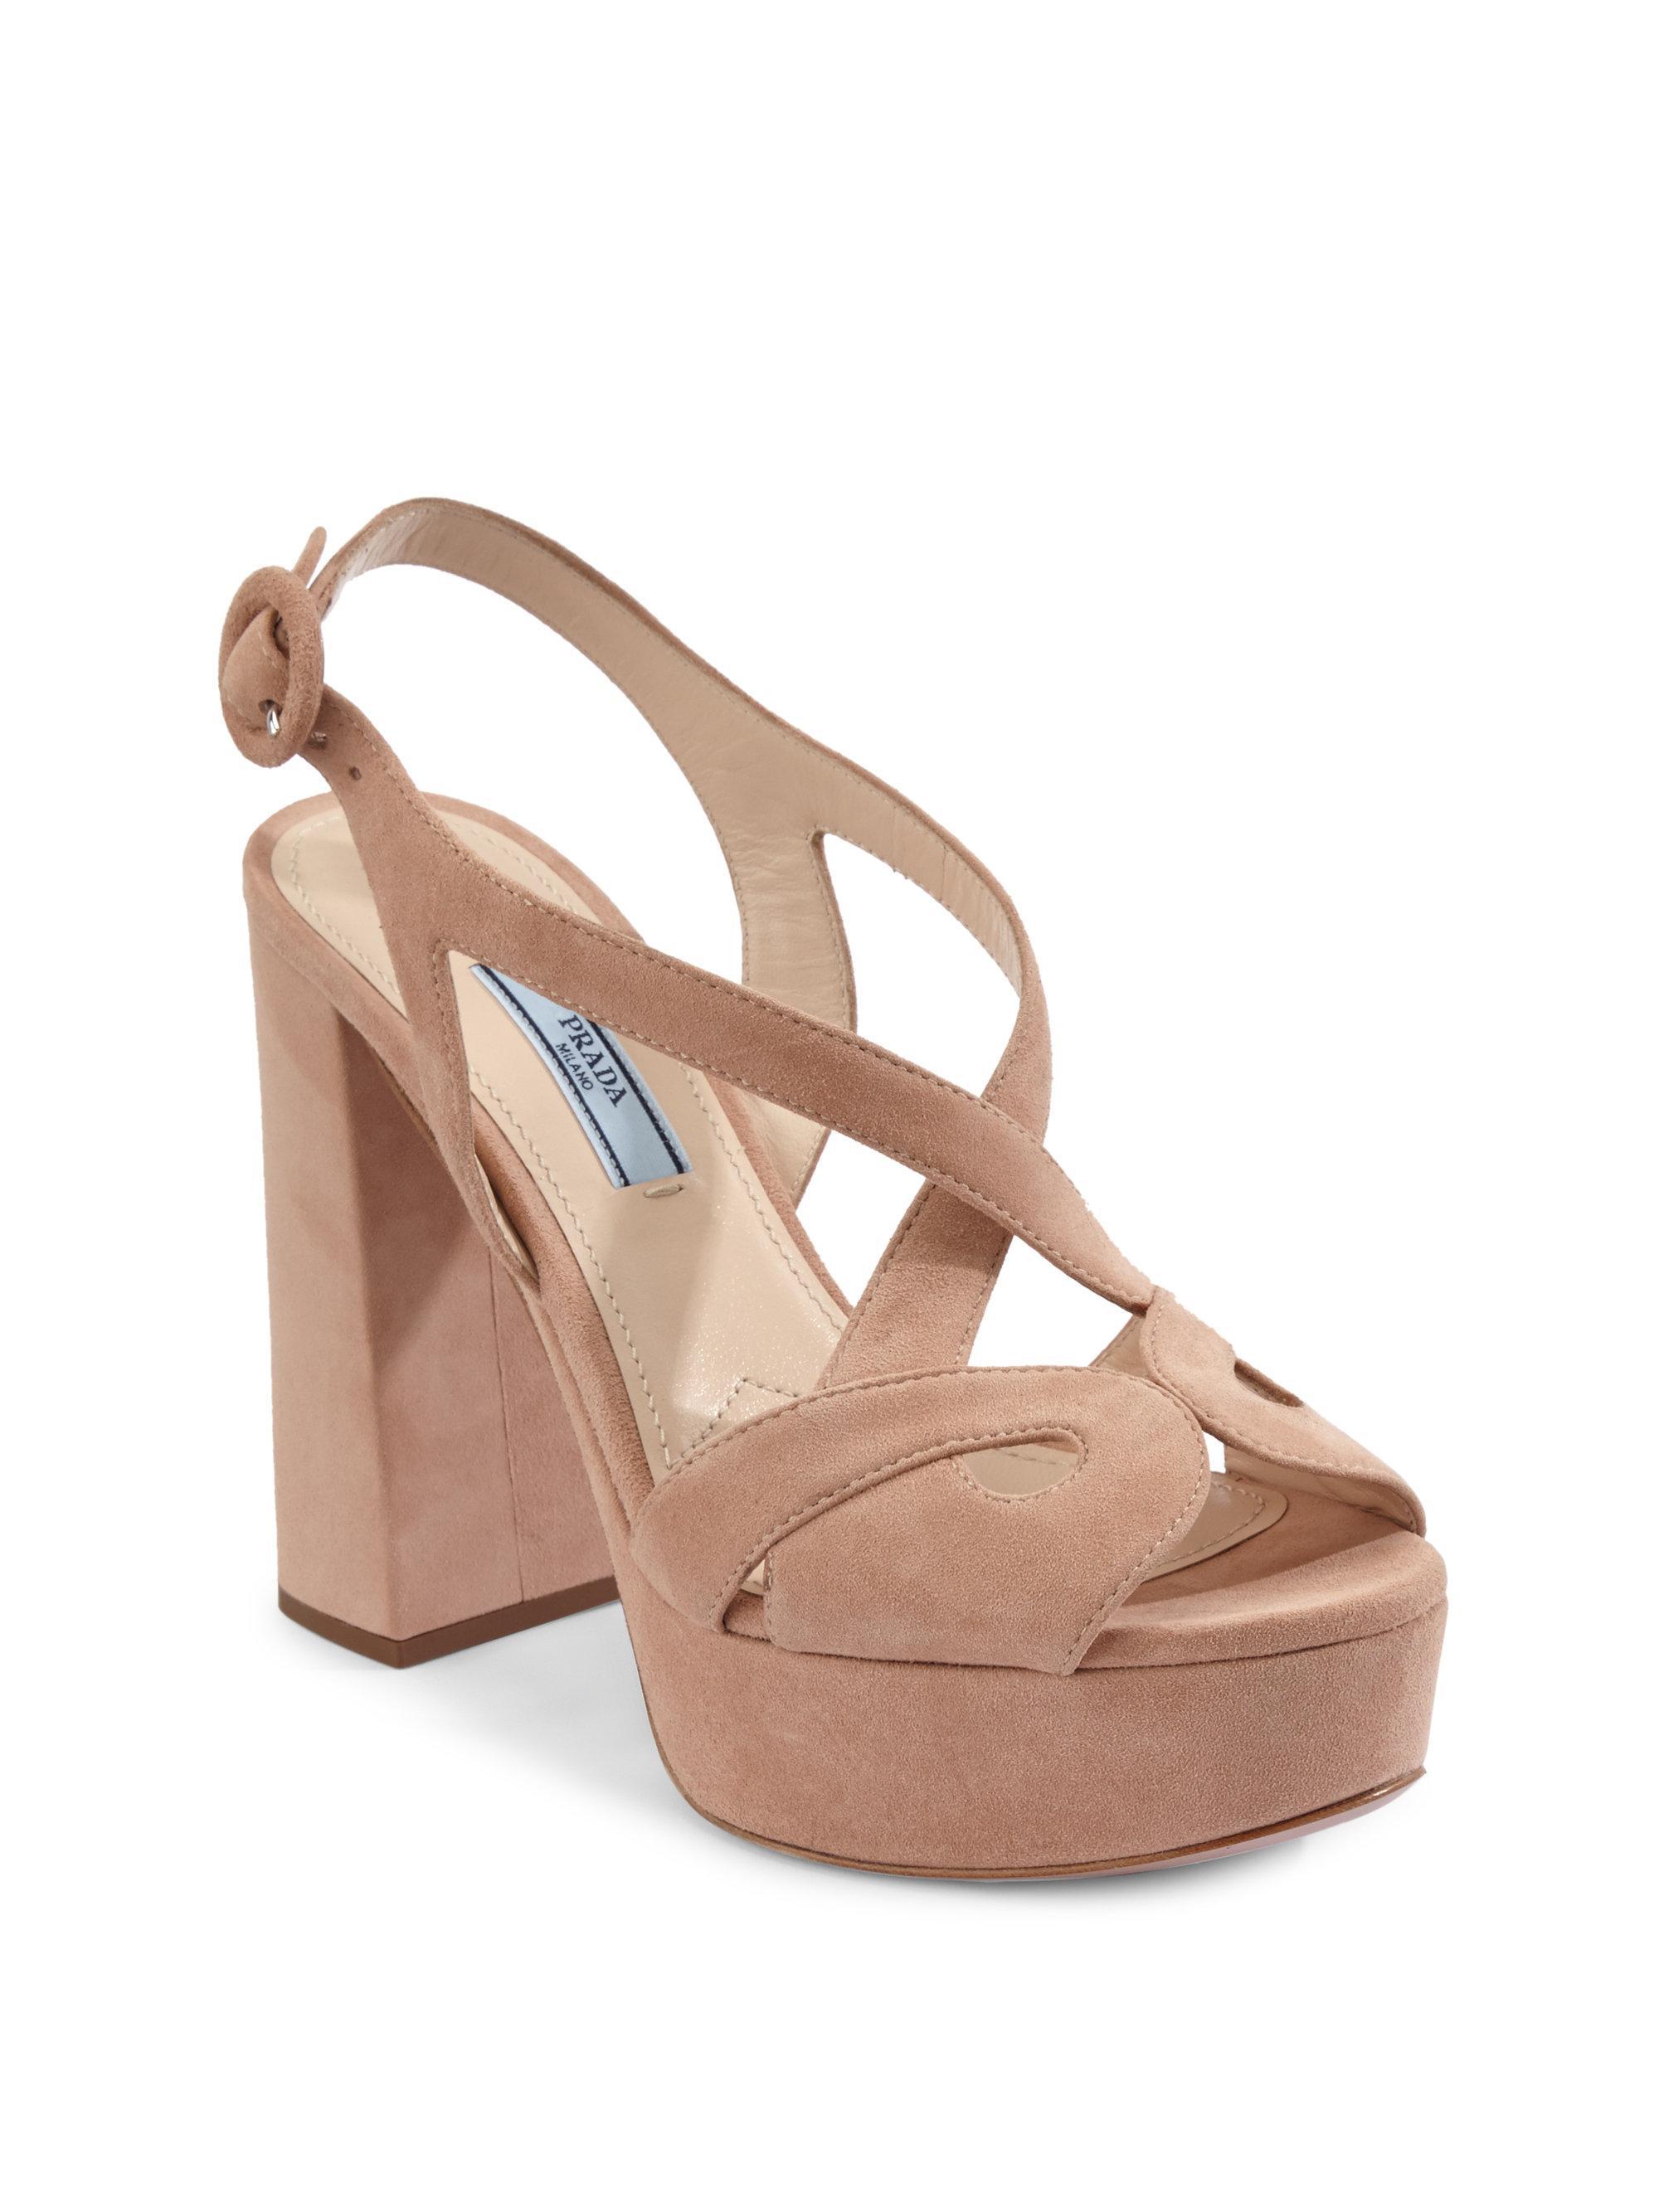 7daaf8ff941 Lyst - Prada Suede Platform Sandals in Natural